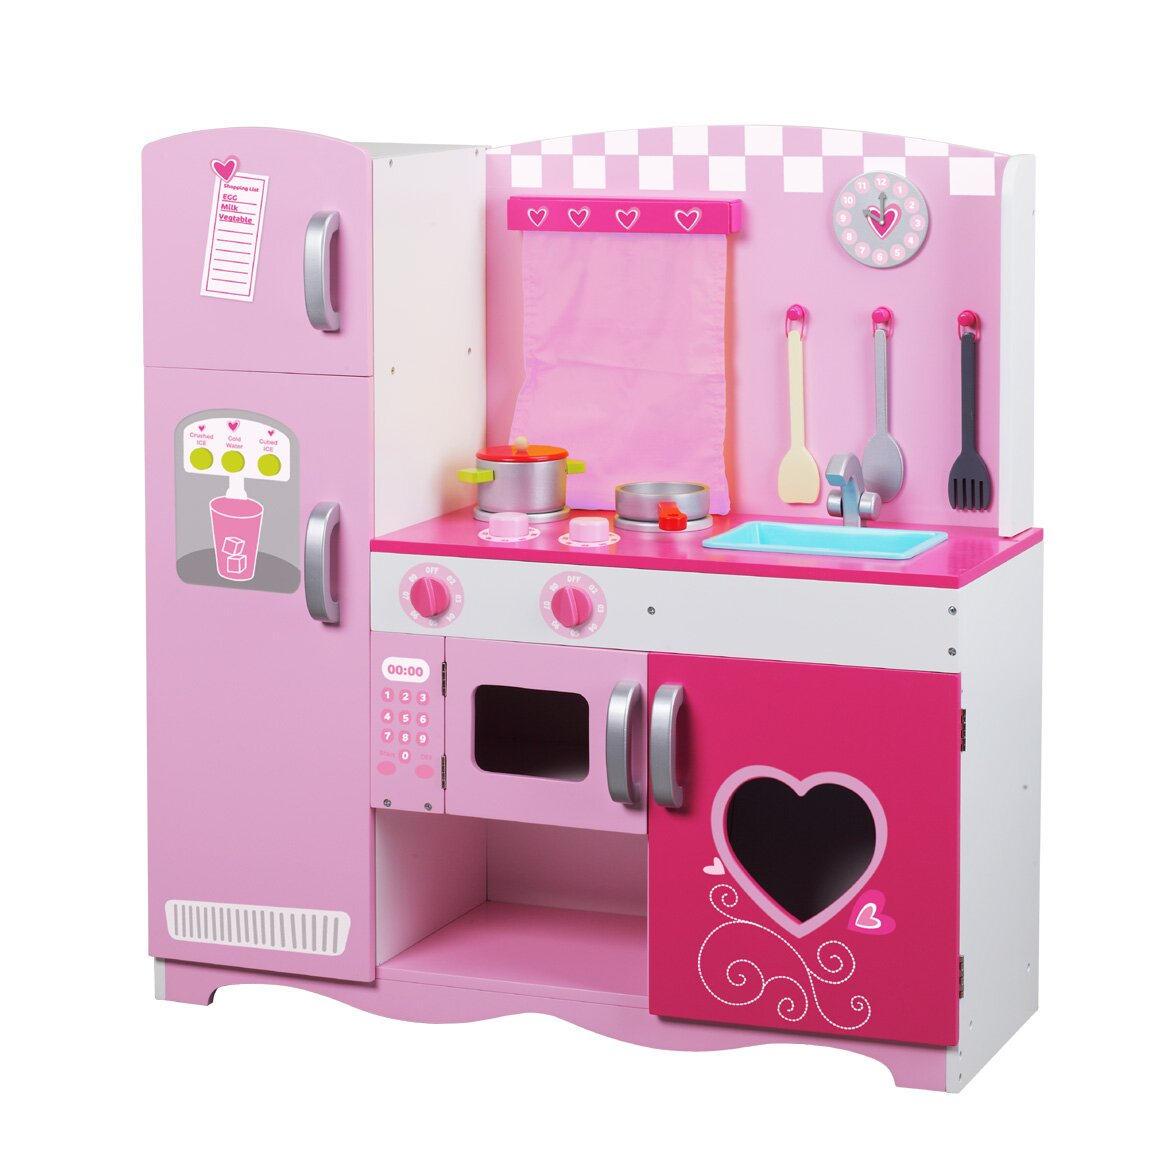 Pink Step 2 Kitchen Classic Toy Wooden Kitchen Set Reviews Wayfair